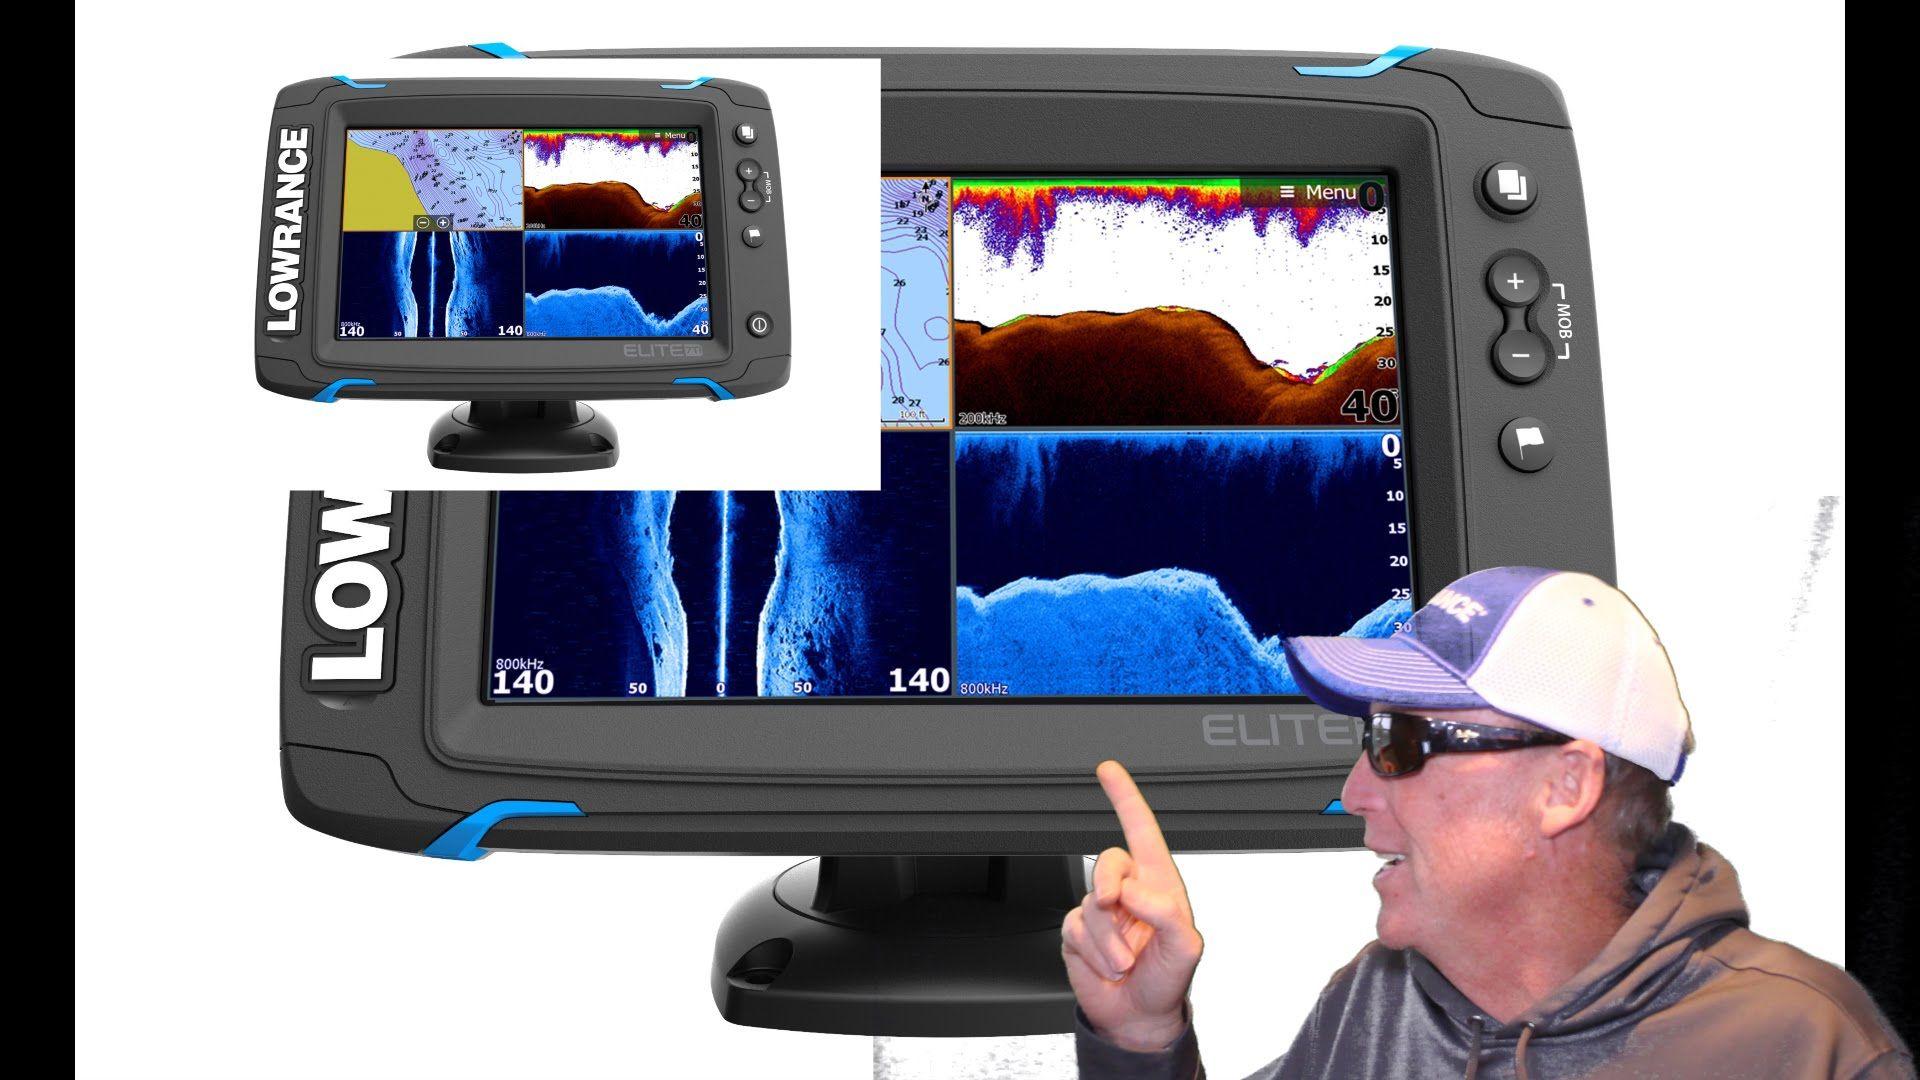 Lowrance Elite Ti Series fishfinder/chartplotter and Hook